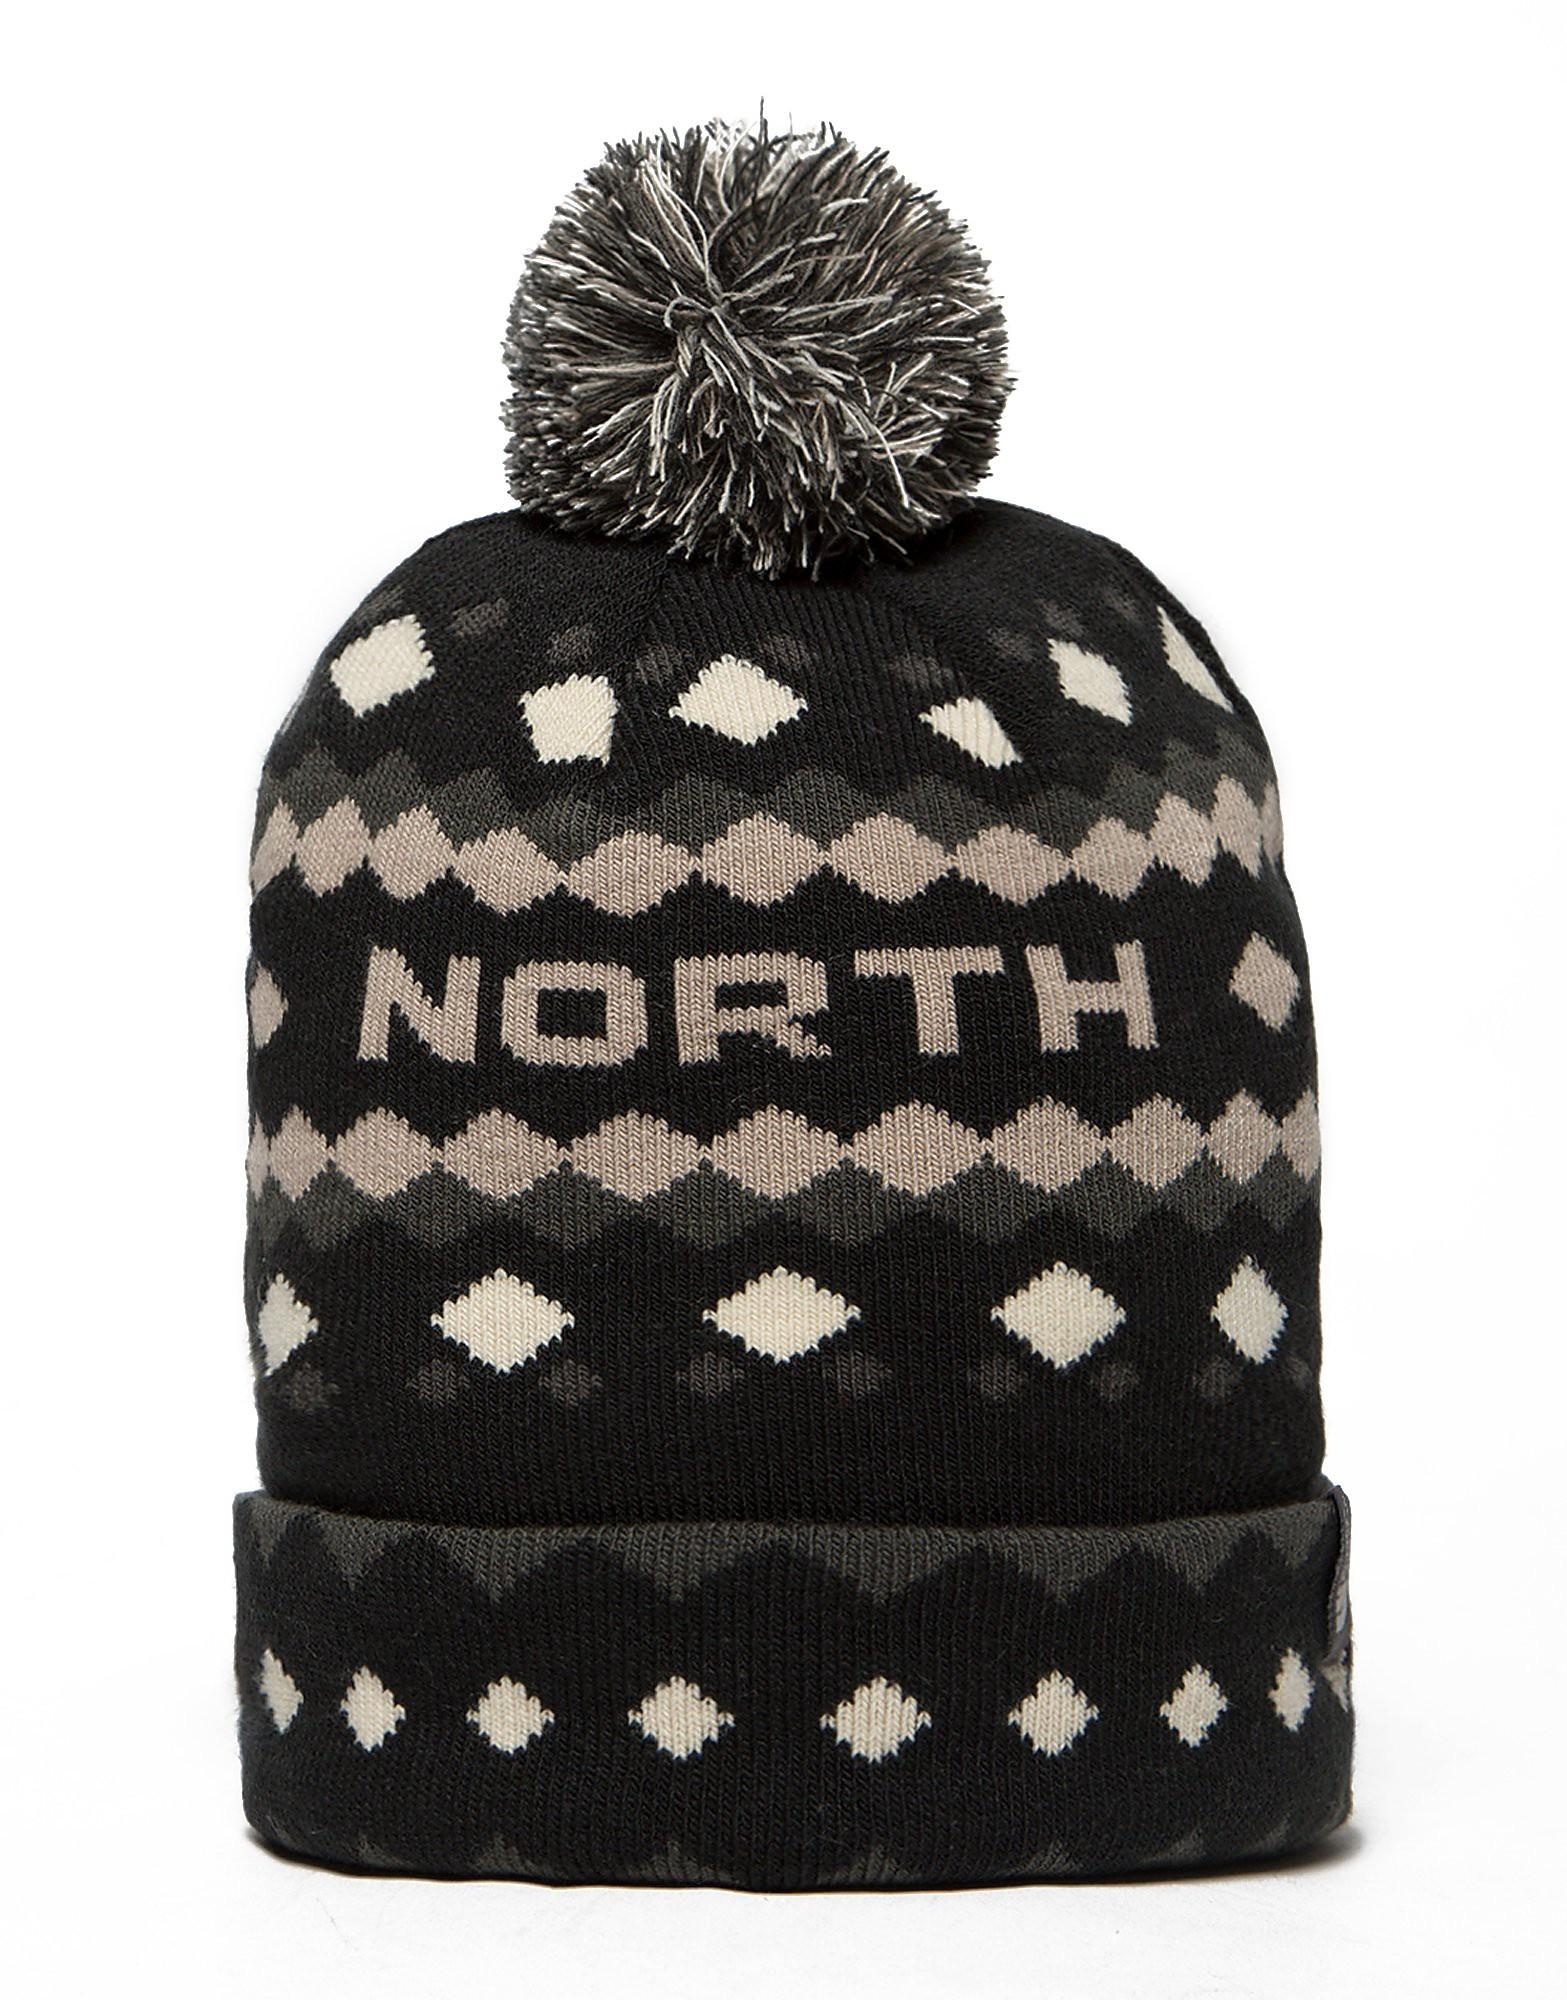 The North Face Ski Tuke Beanie Hat